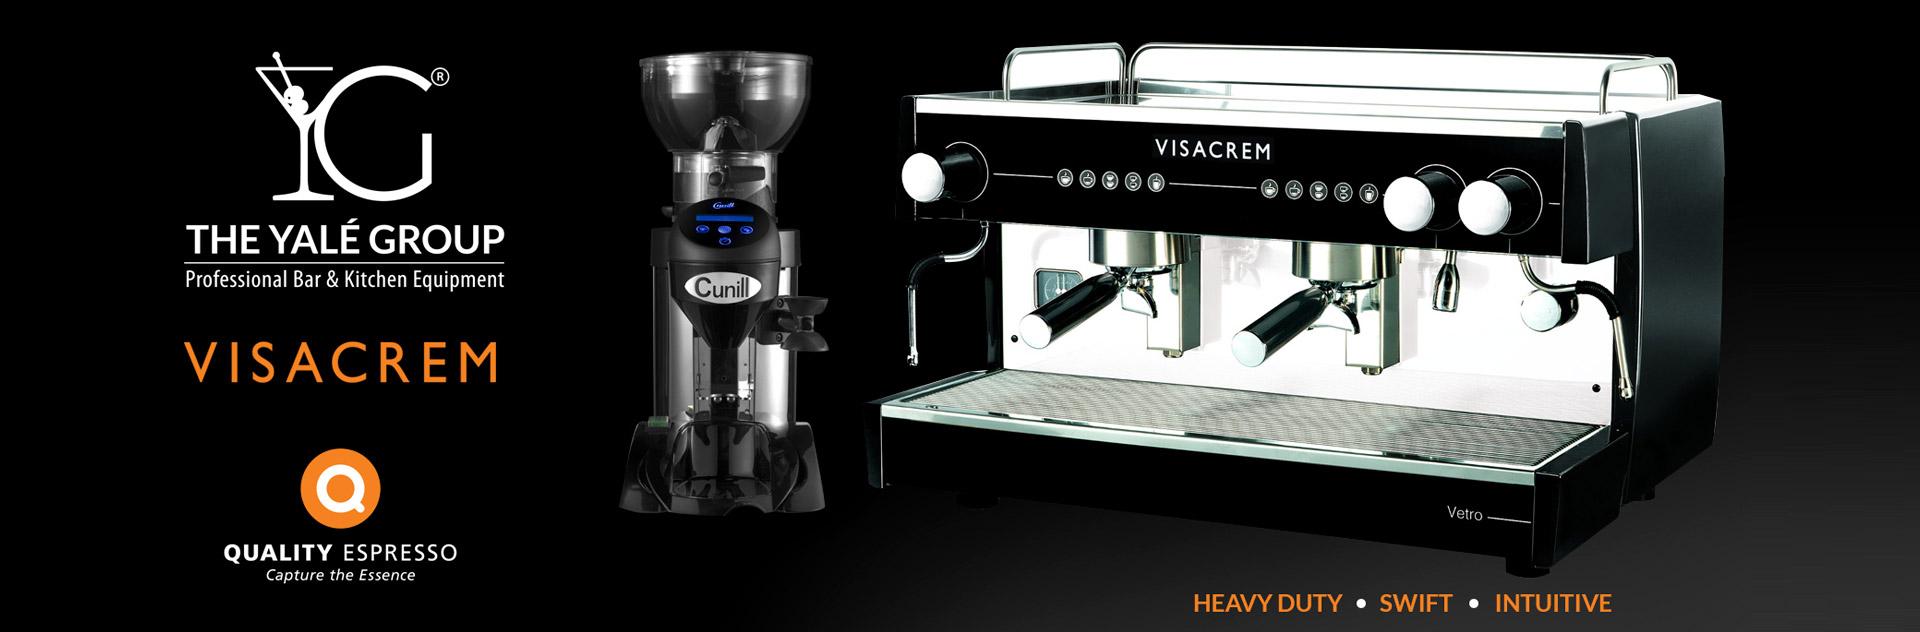 Visacrem Coffee Machine